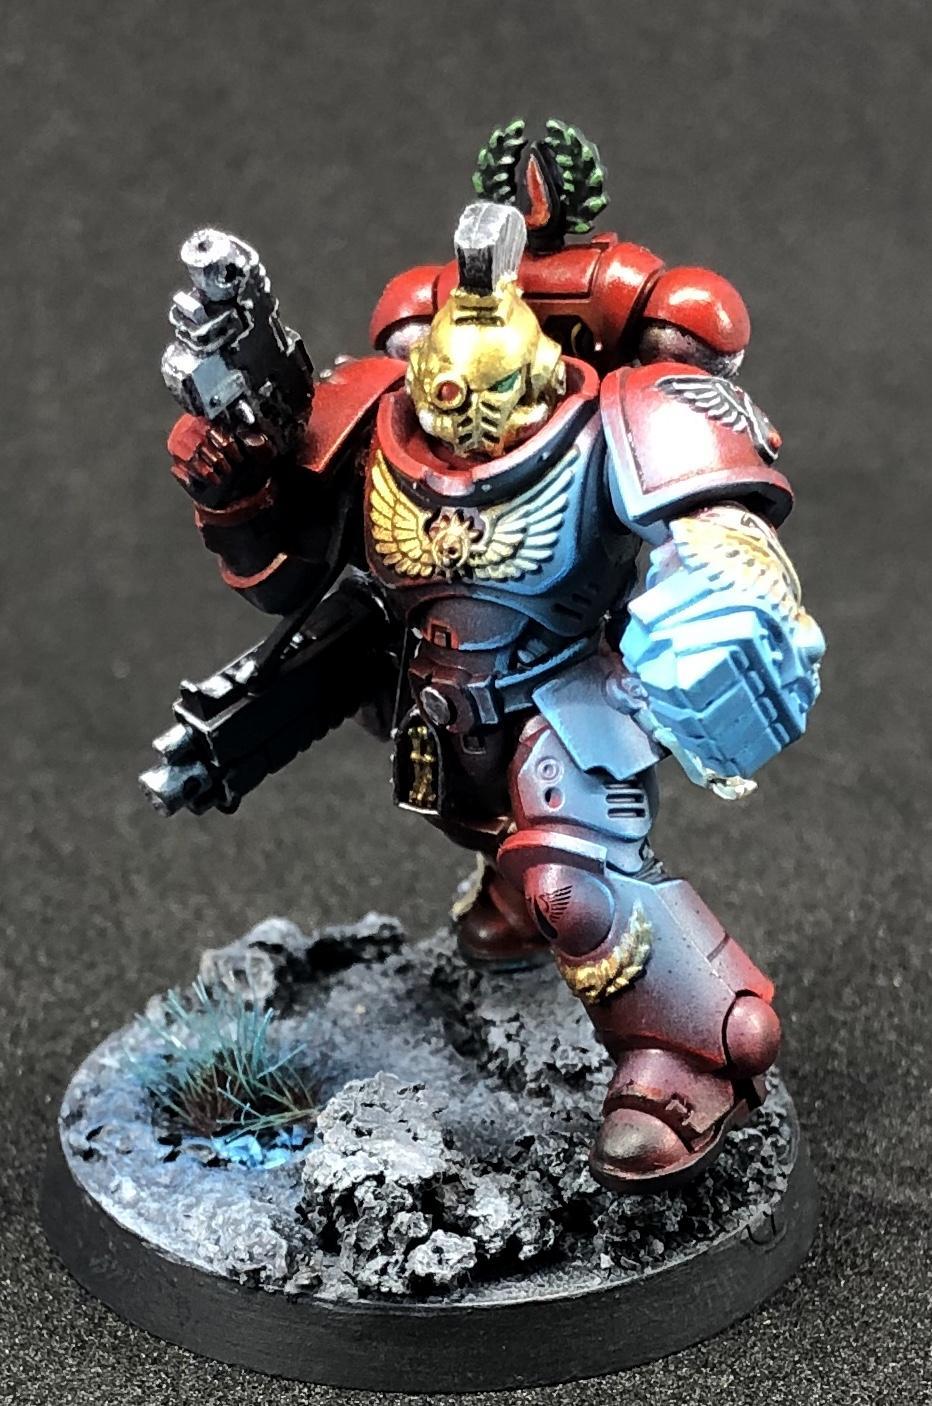 Blood Angels, Lieutenant, Object Source Lighting, Power Fist, Primaris, Primaris Marines, Space Marines, Warhammer 40,000, Warhammer Fantasy